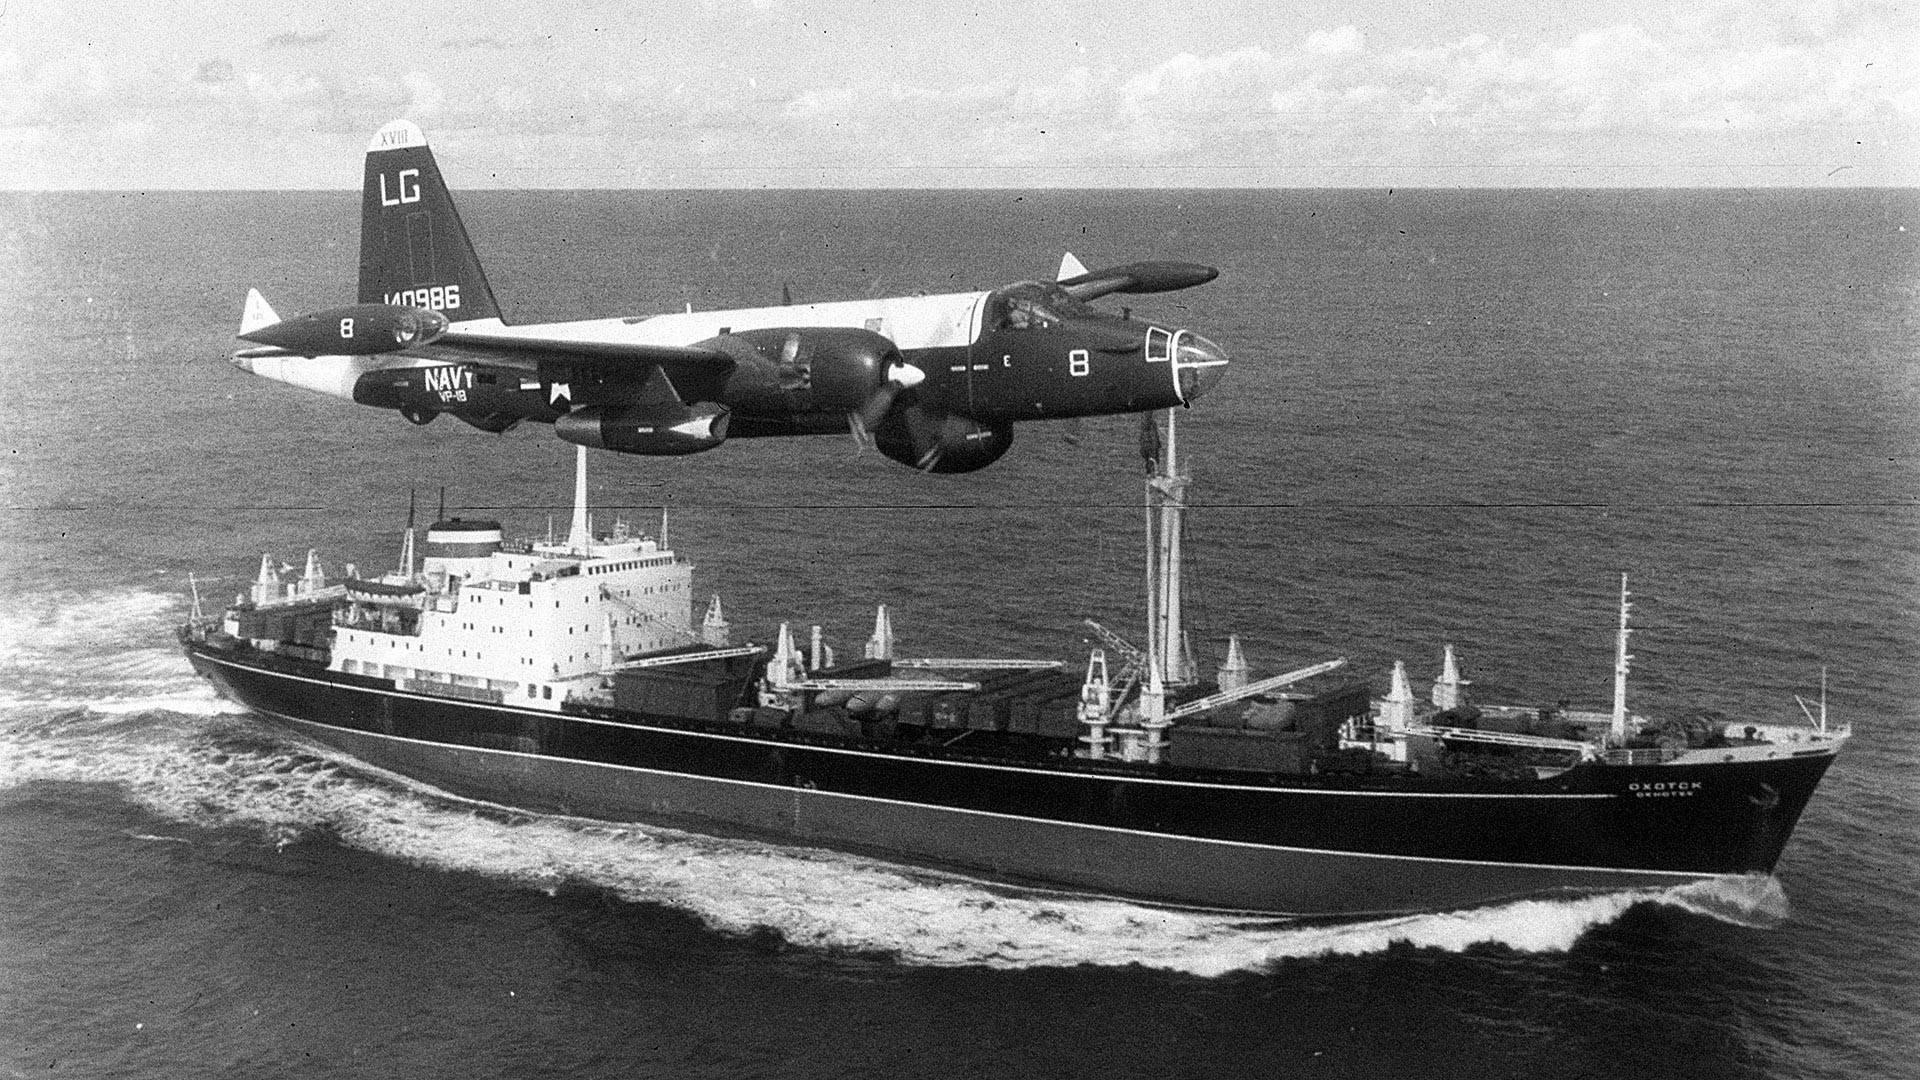 Američki patrolni avion P2V Neptun leti nad sovjetskim teretnim brodom tijekom Kubanske raketne krize.